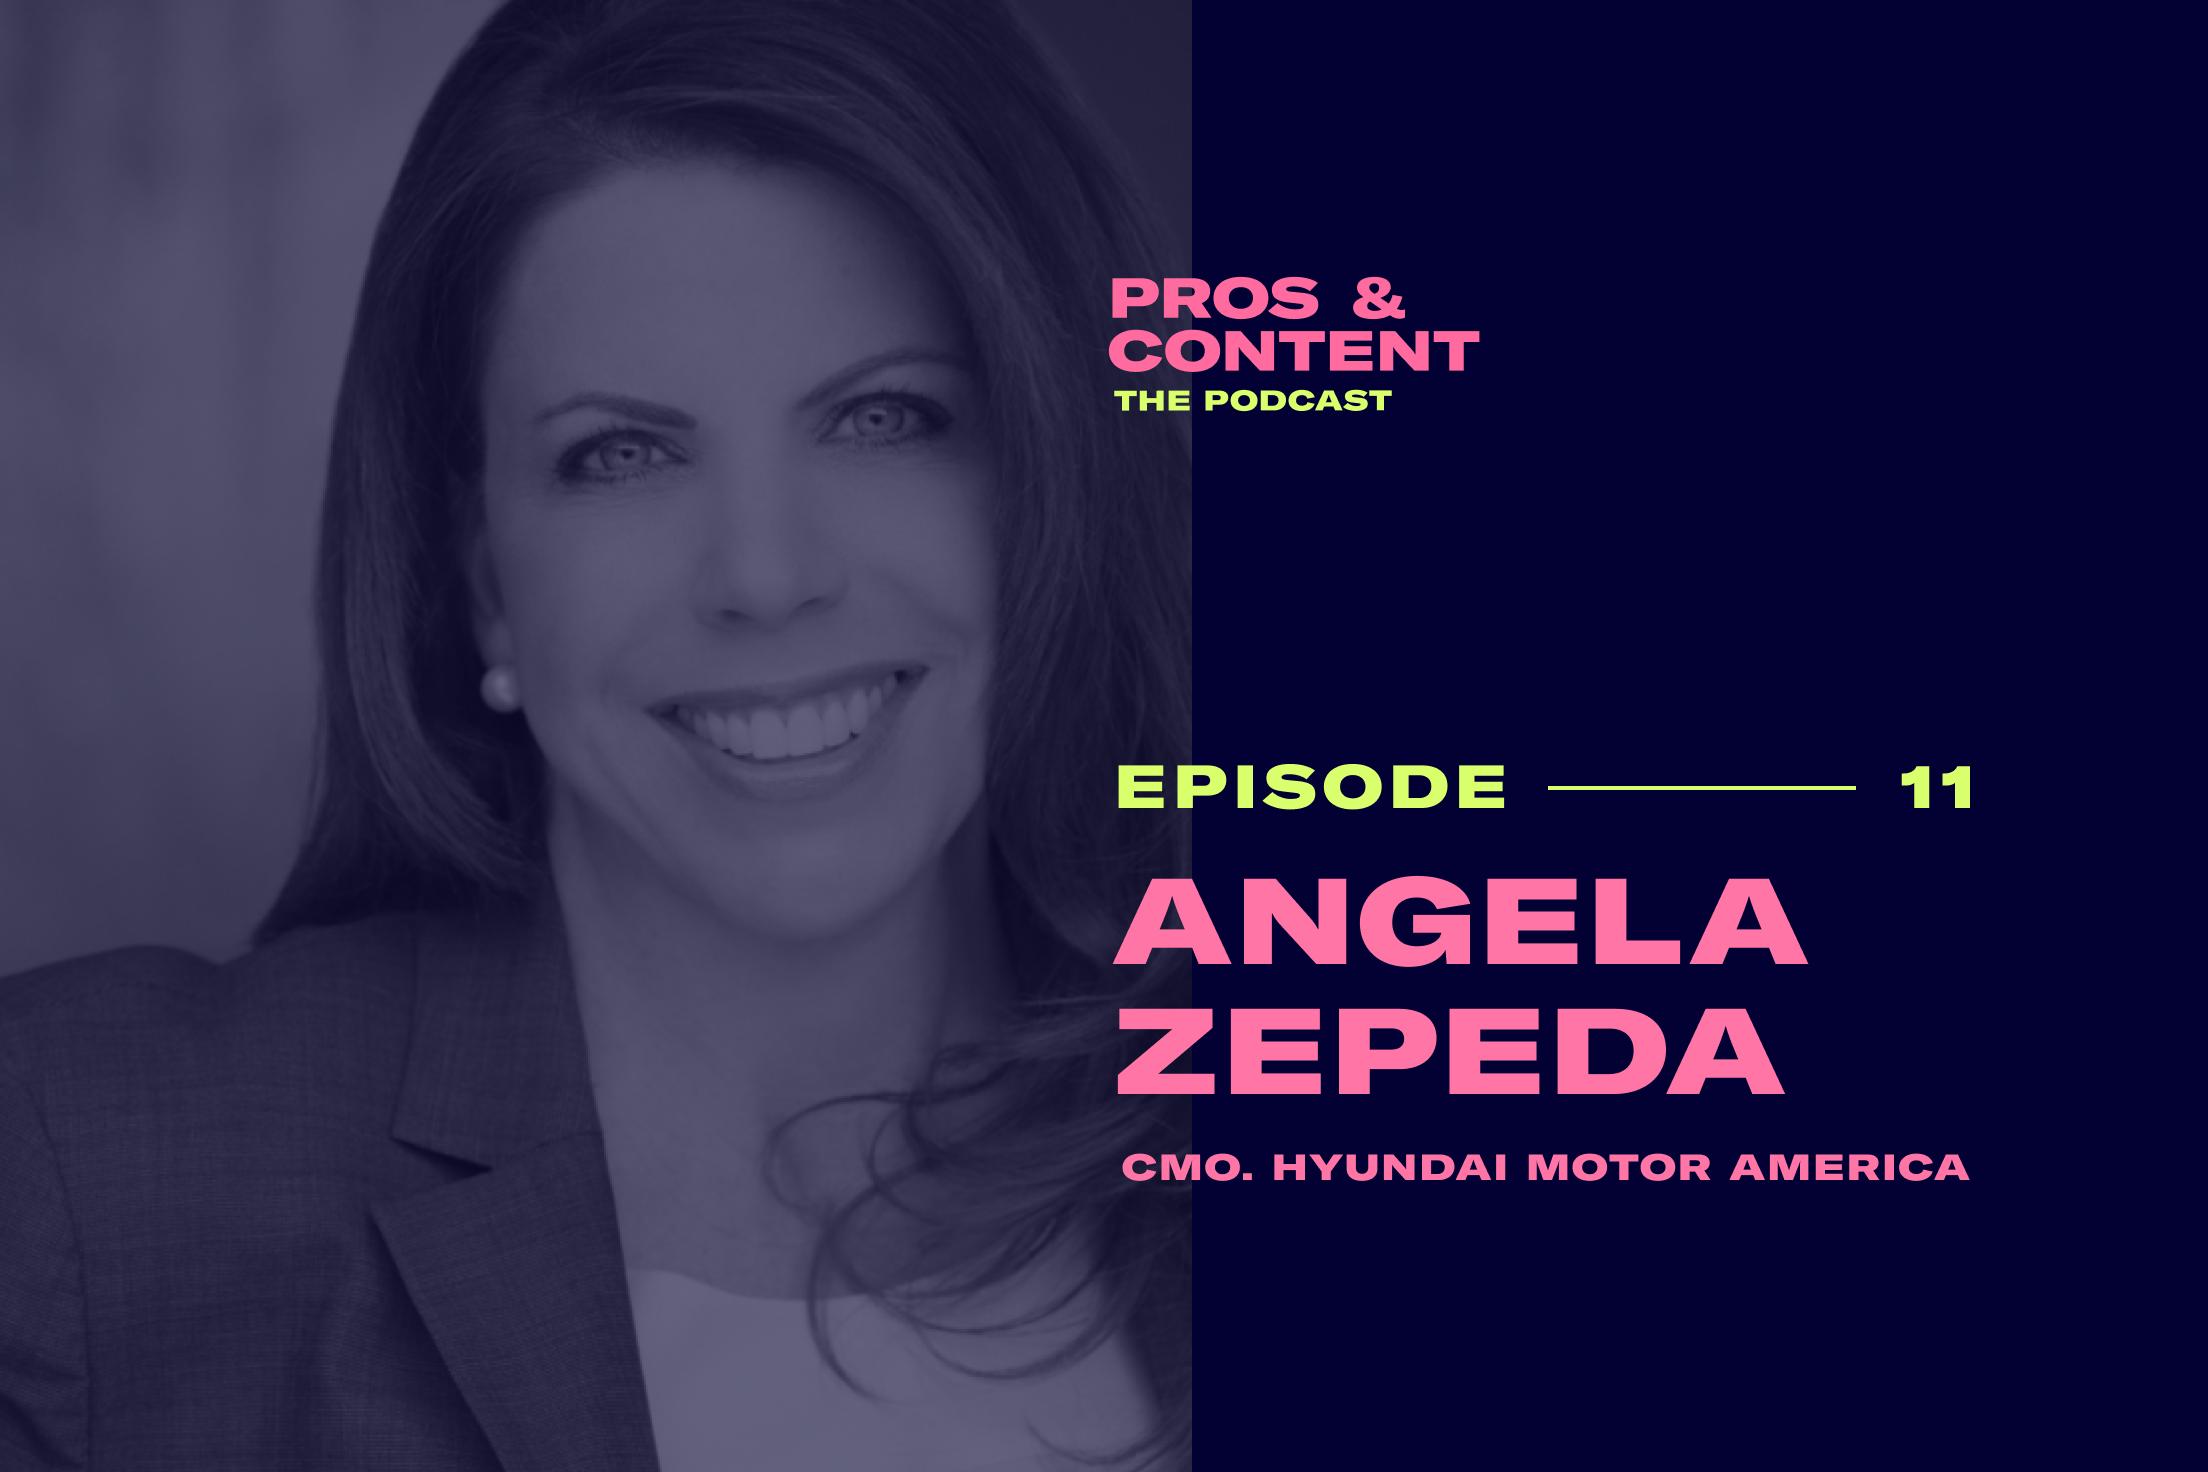 Pros & Content Podcast: Angela Zepeda (CMO of Hyundai Motor America)